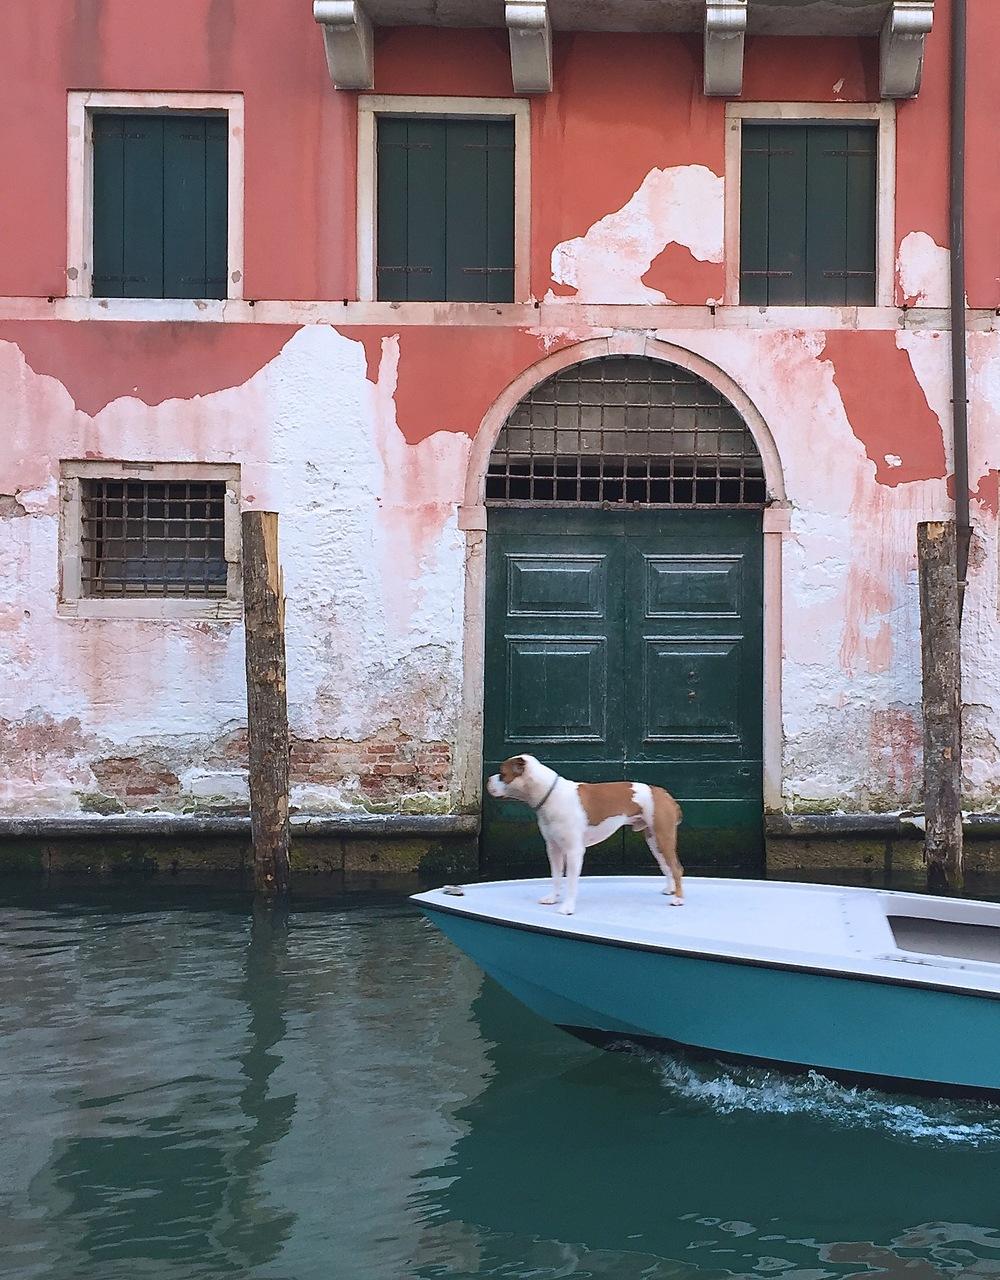 A dog on a boat.